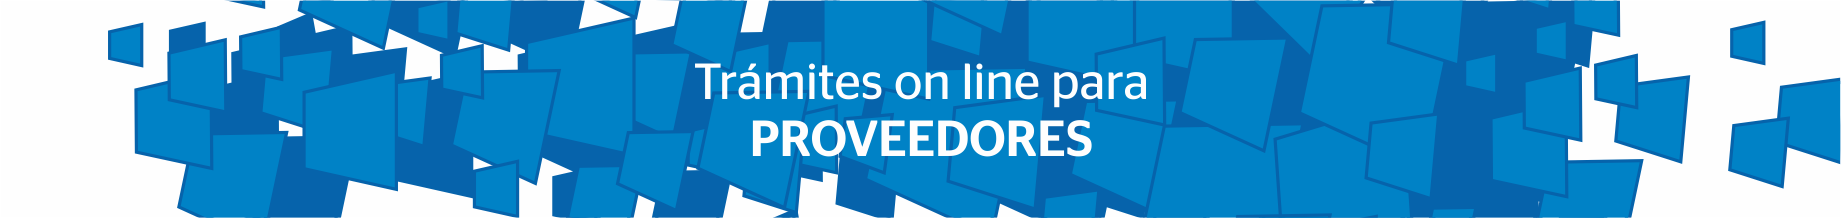 Trámites on-line para PROVEEDORES